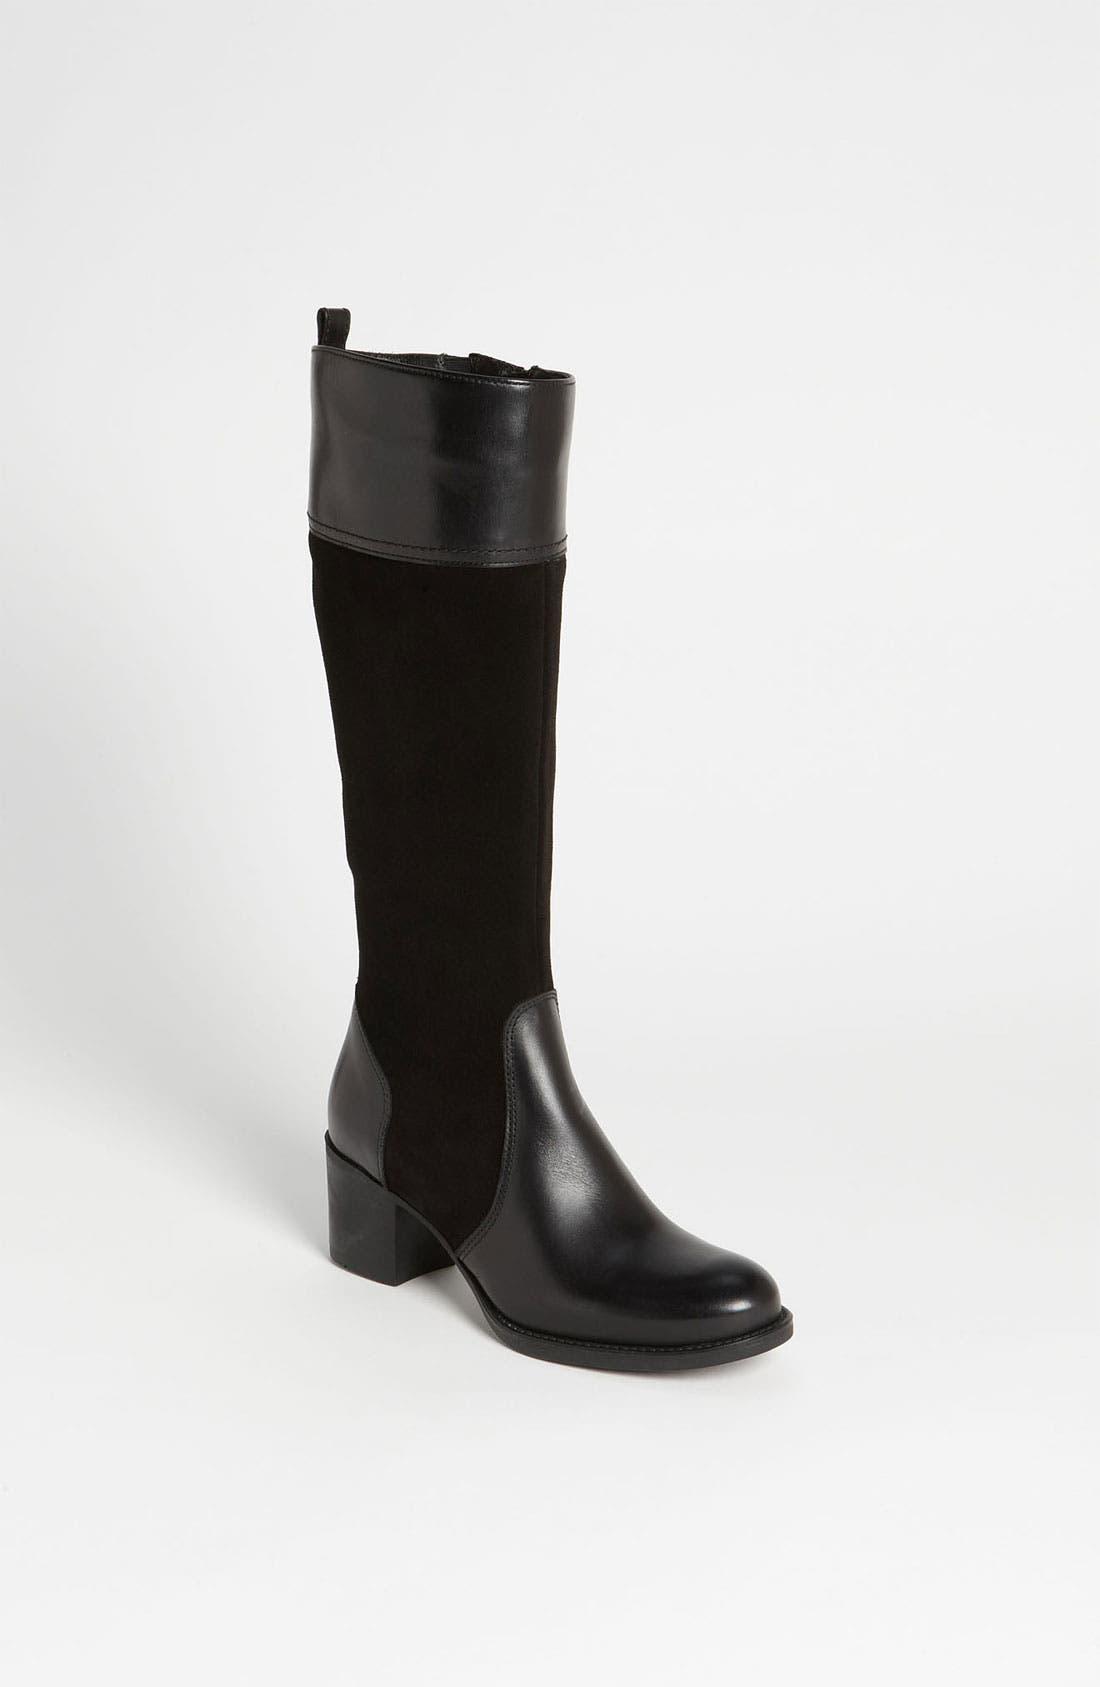 Alternate Image 1 Selected - La Canadienne 'Pierre' Boot